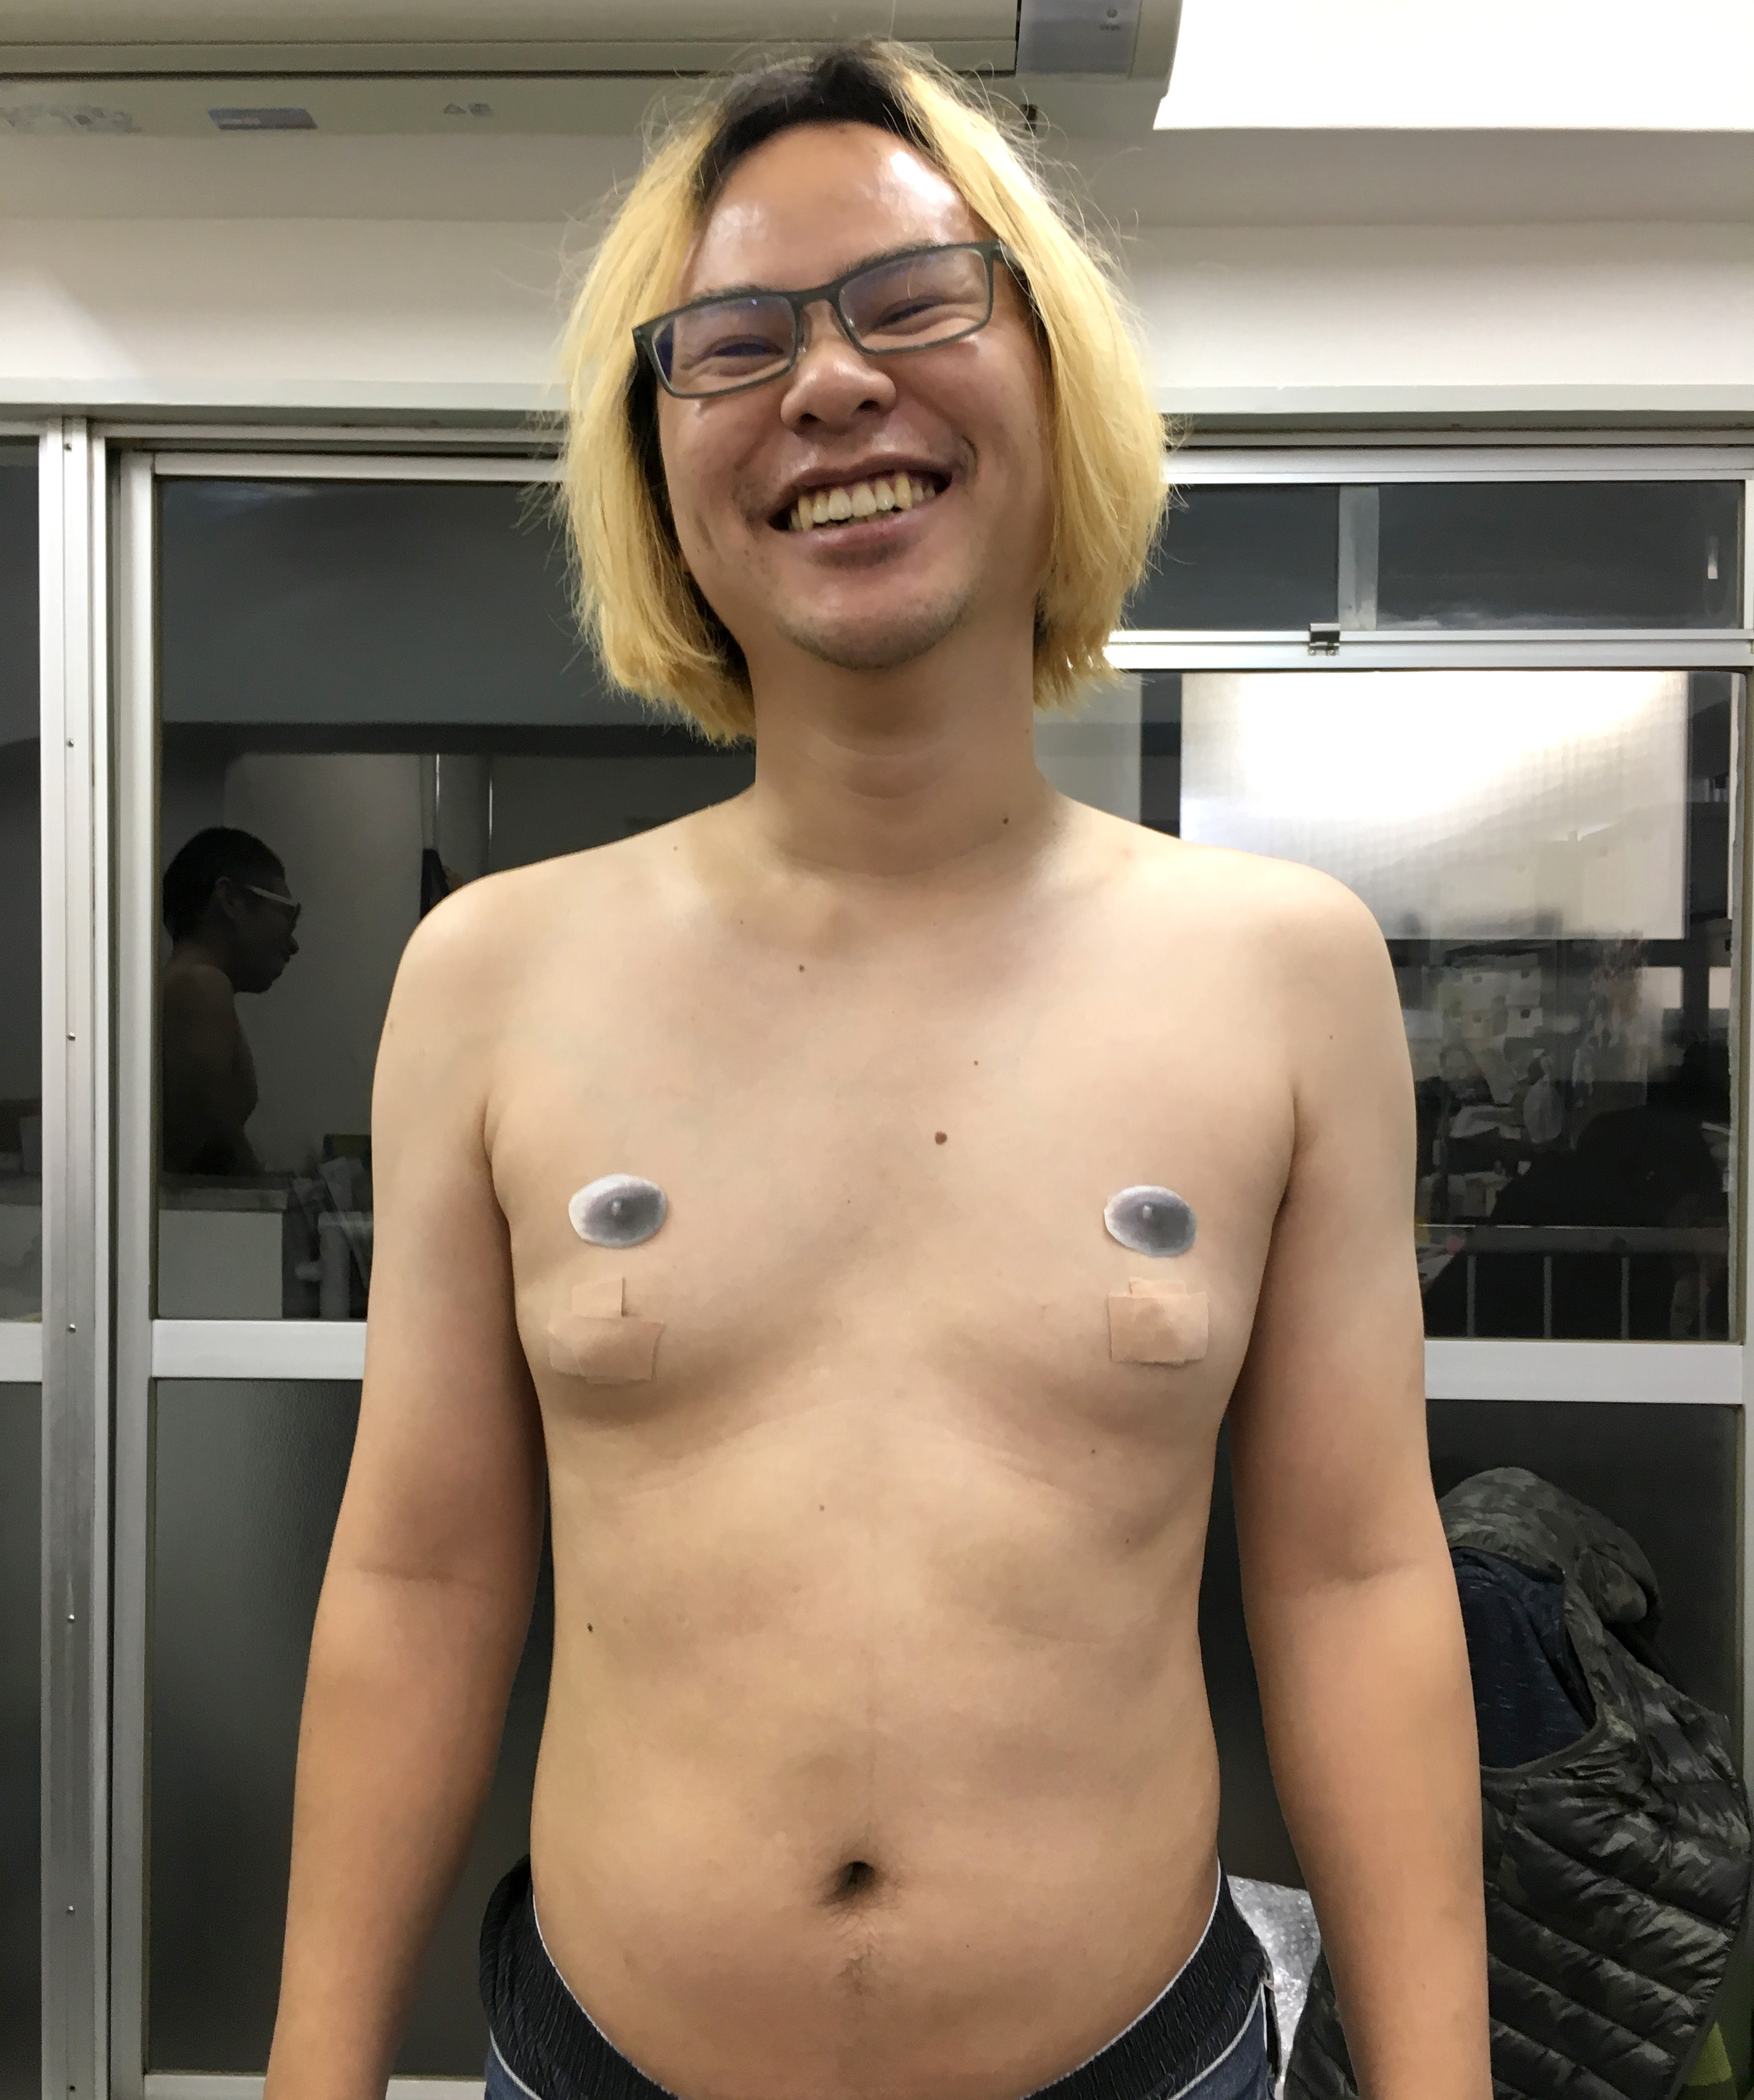 chikubi9